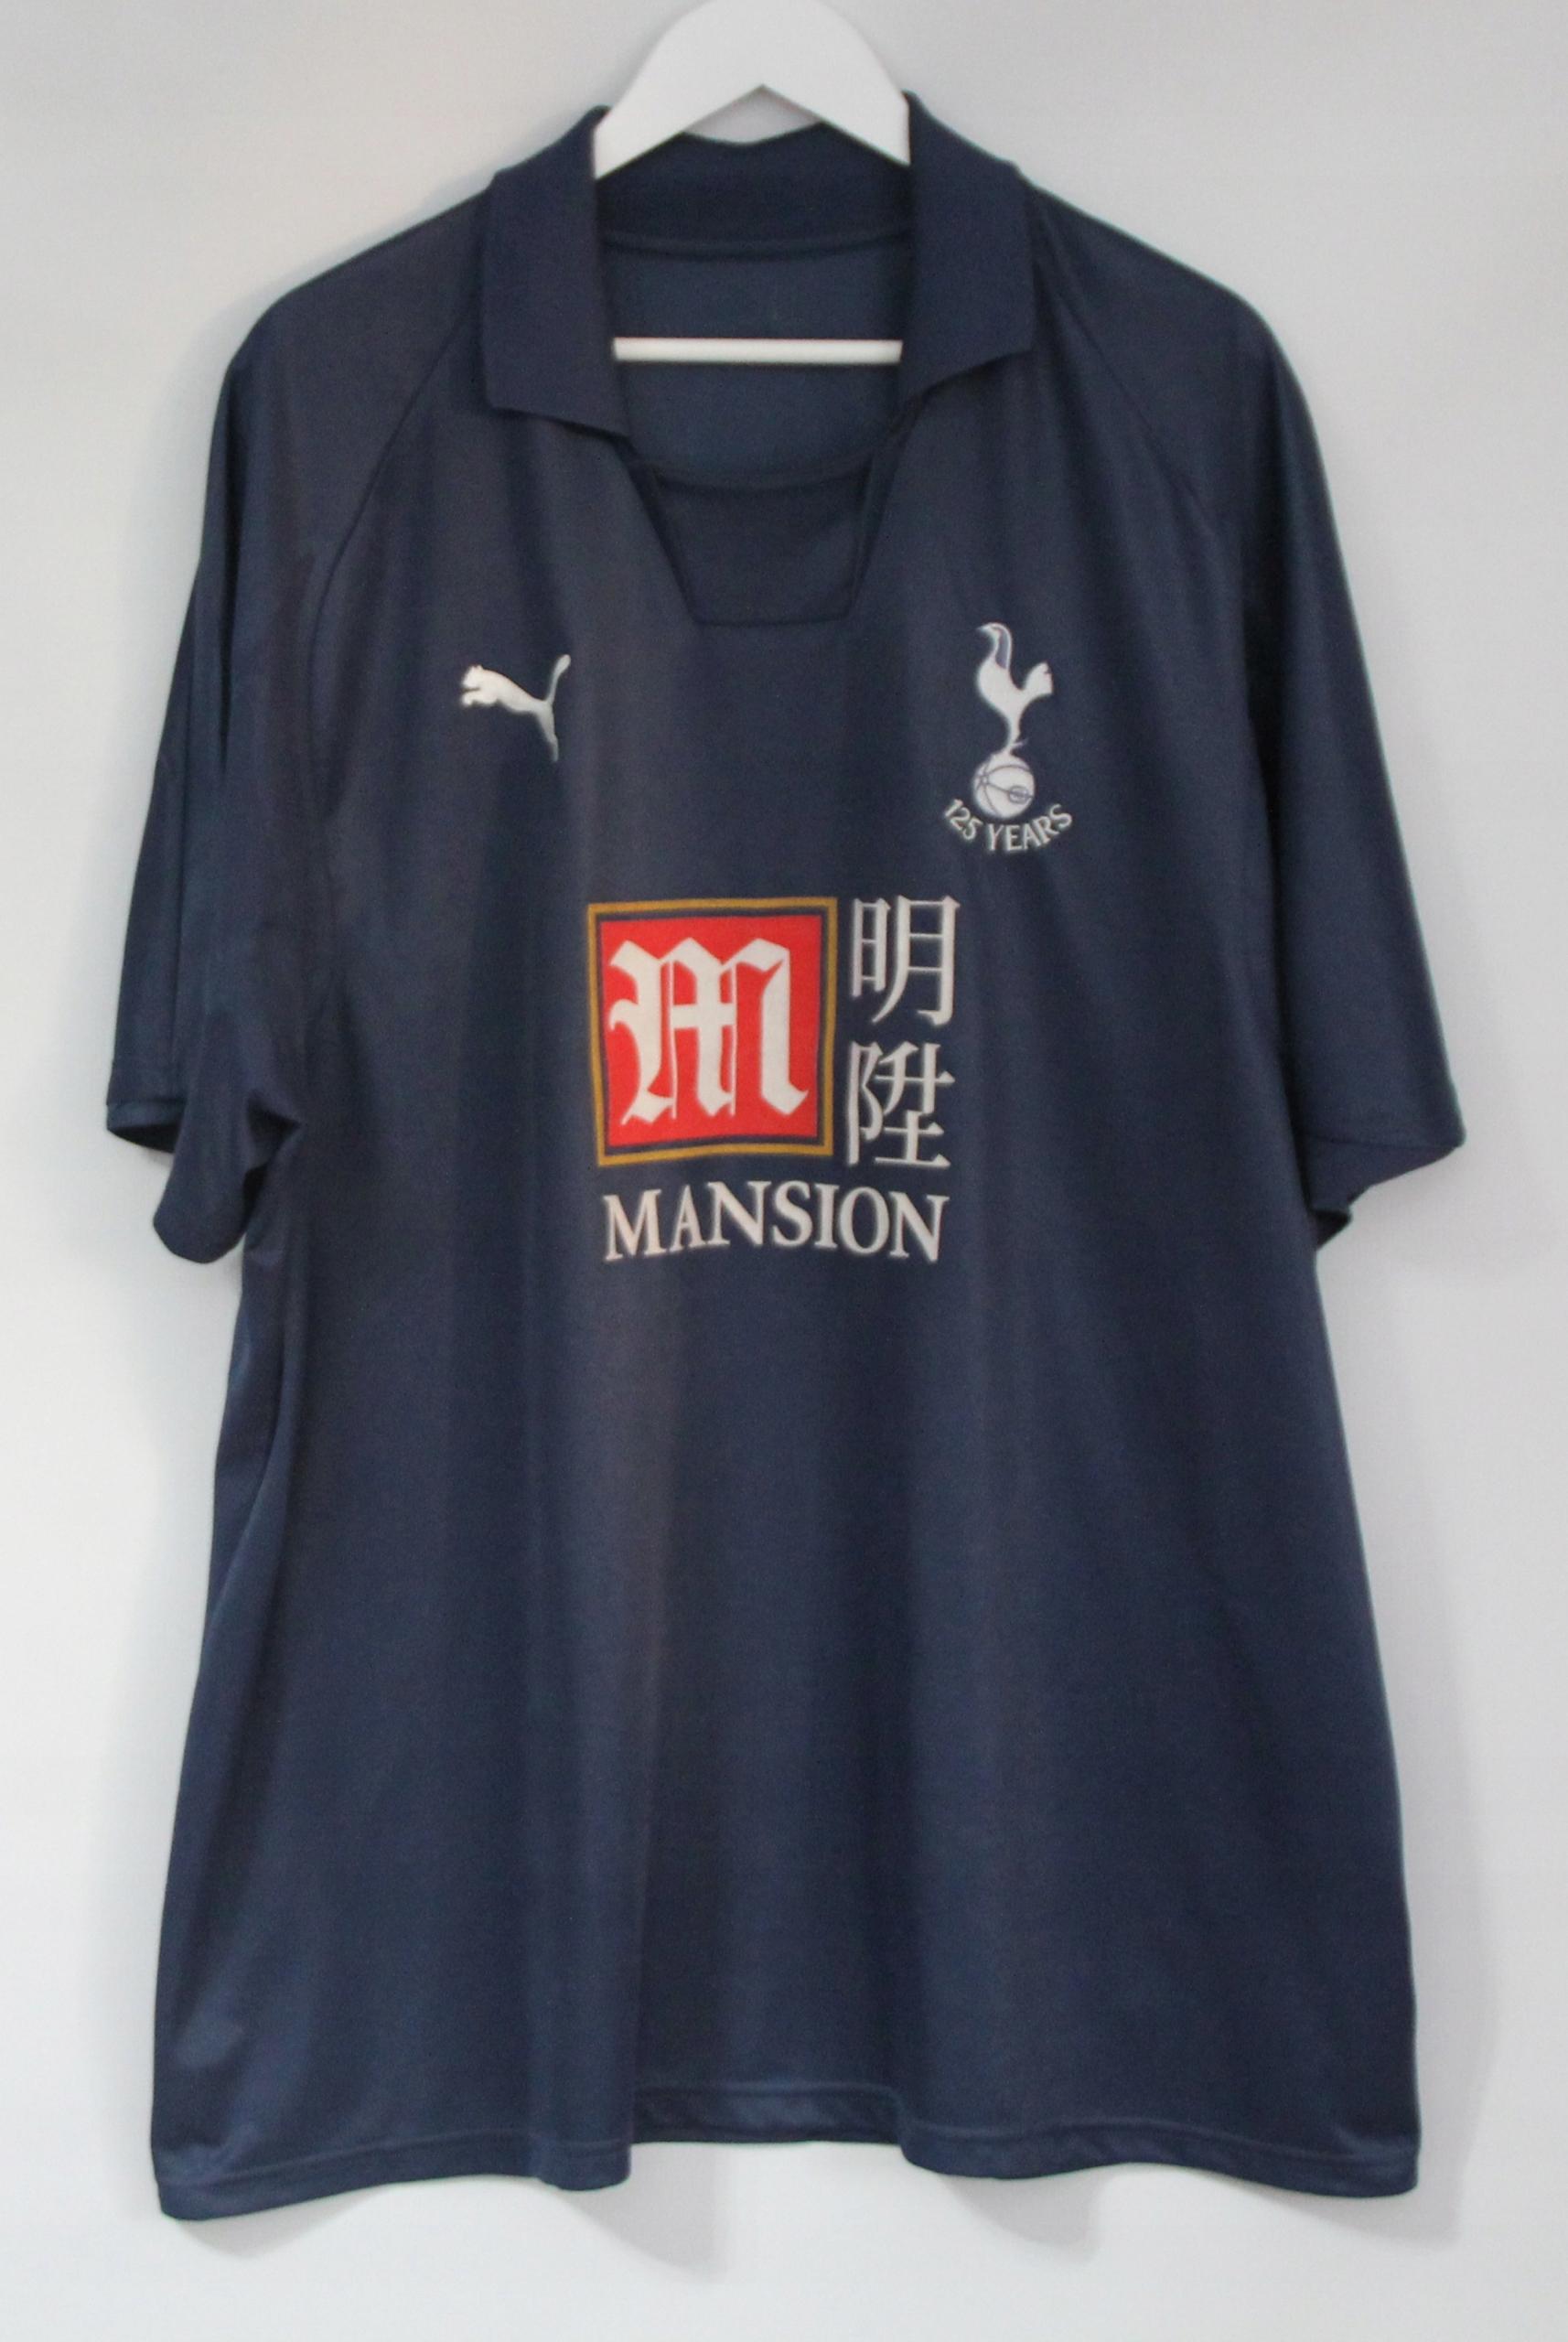 Koszulka Puma Tottenham Hotspur F.C. 3-DAVE